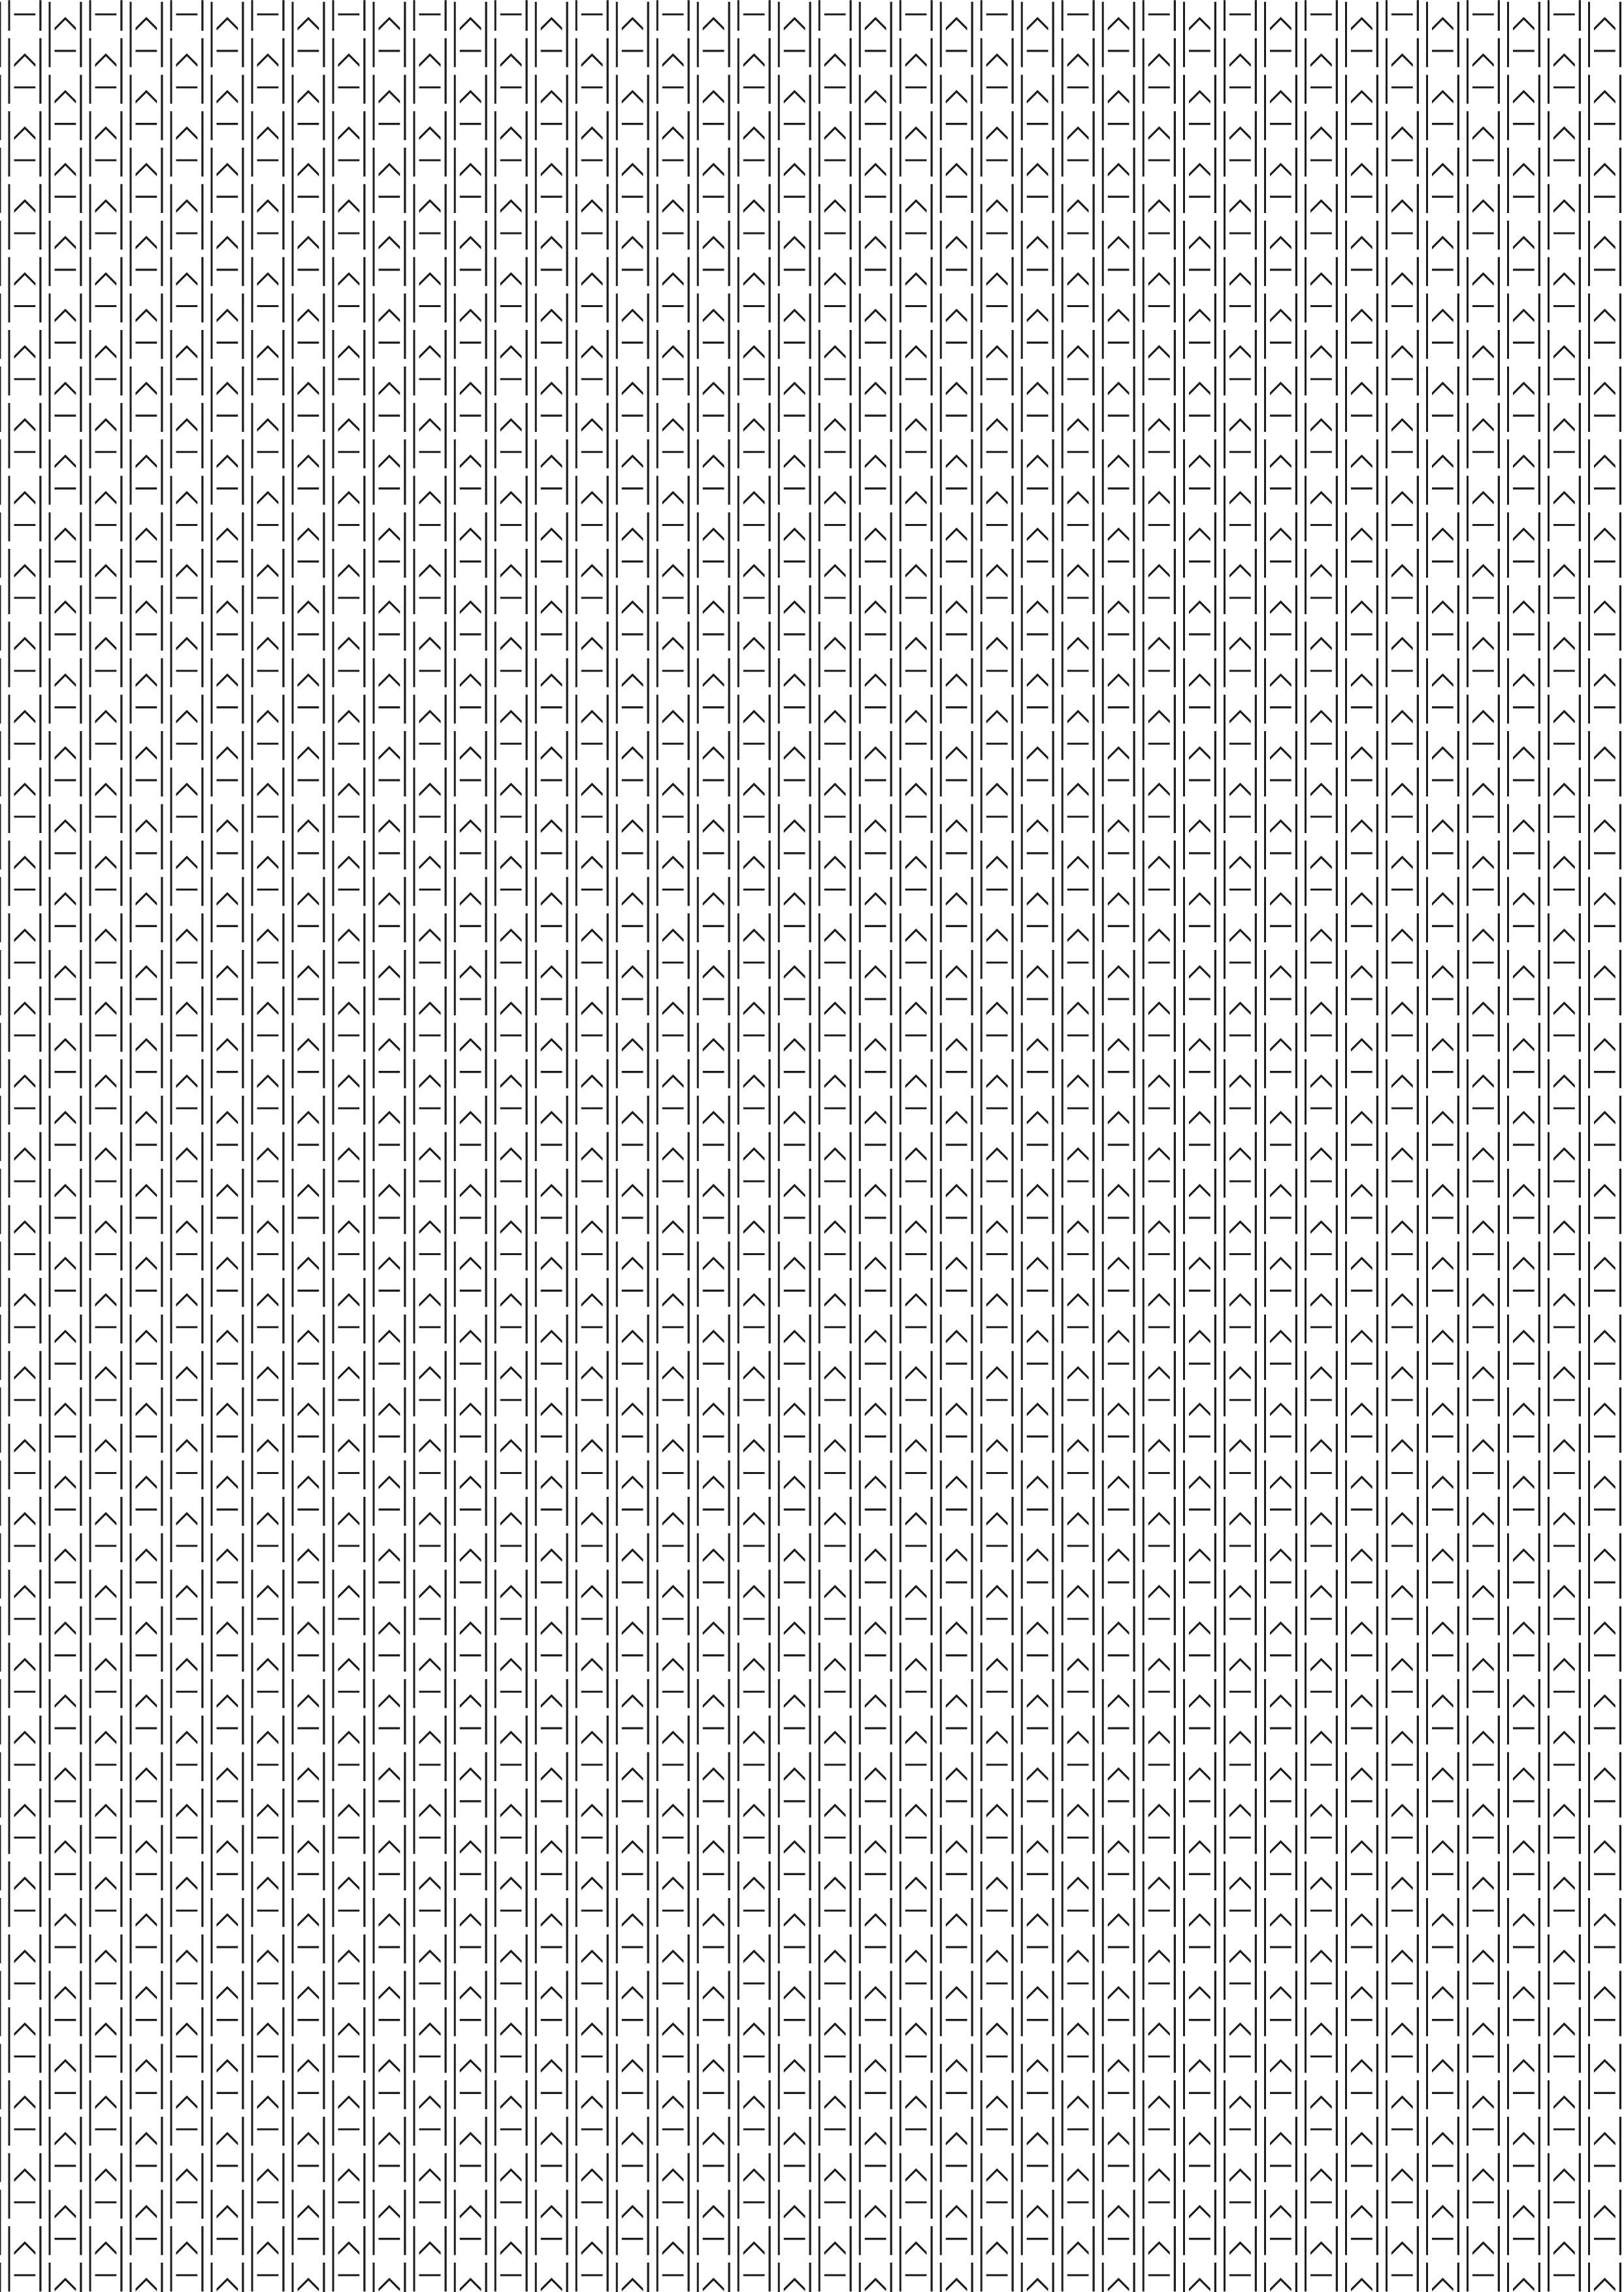 TWH-pattern-black-web.jpg